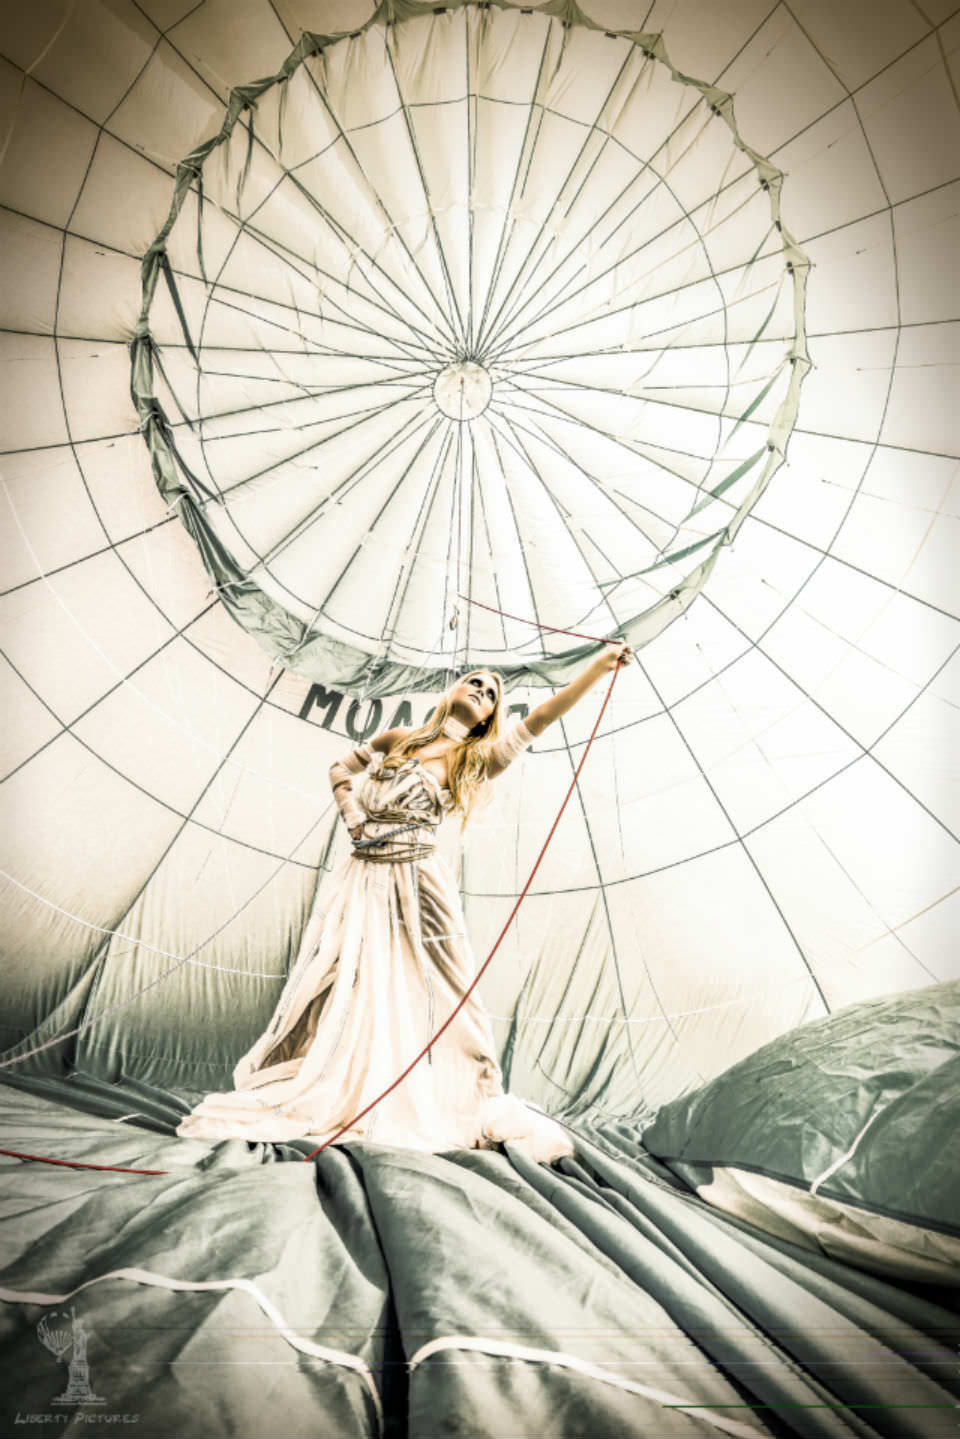 Foto Shooting im Ballon mit Frau und Seil